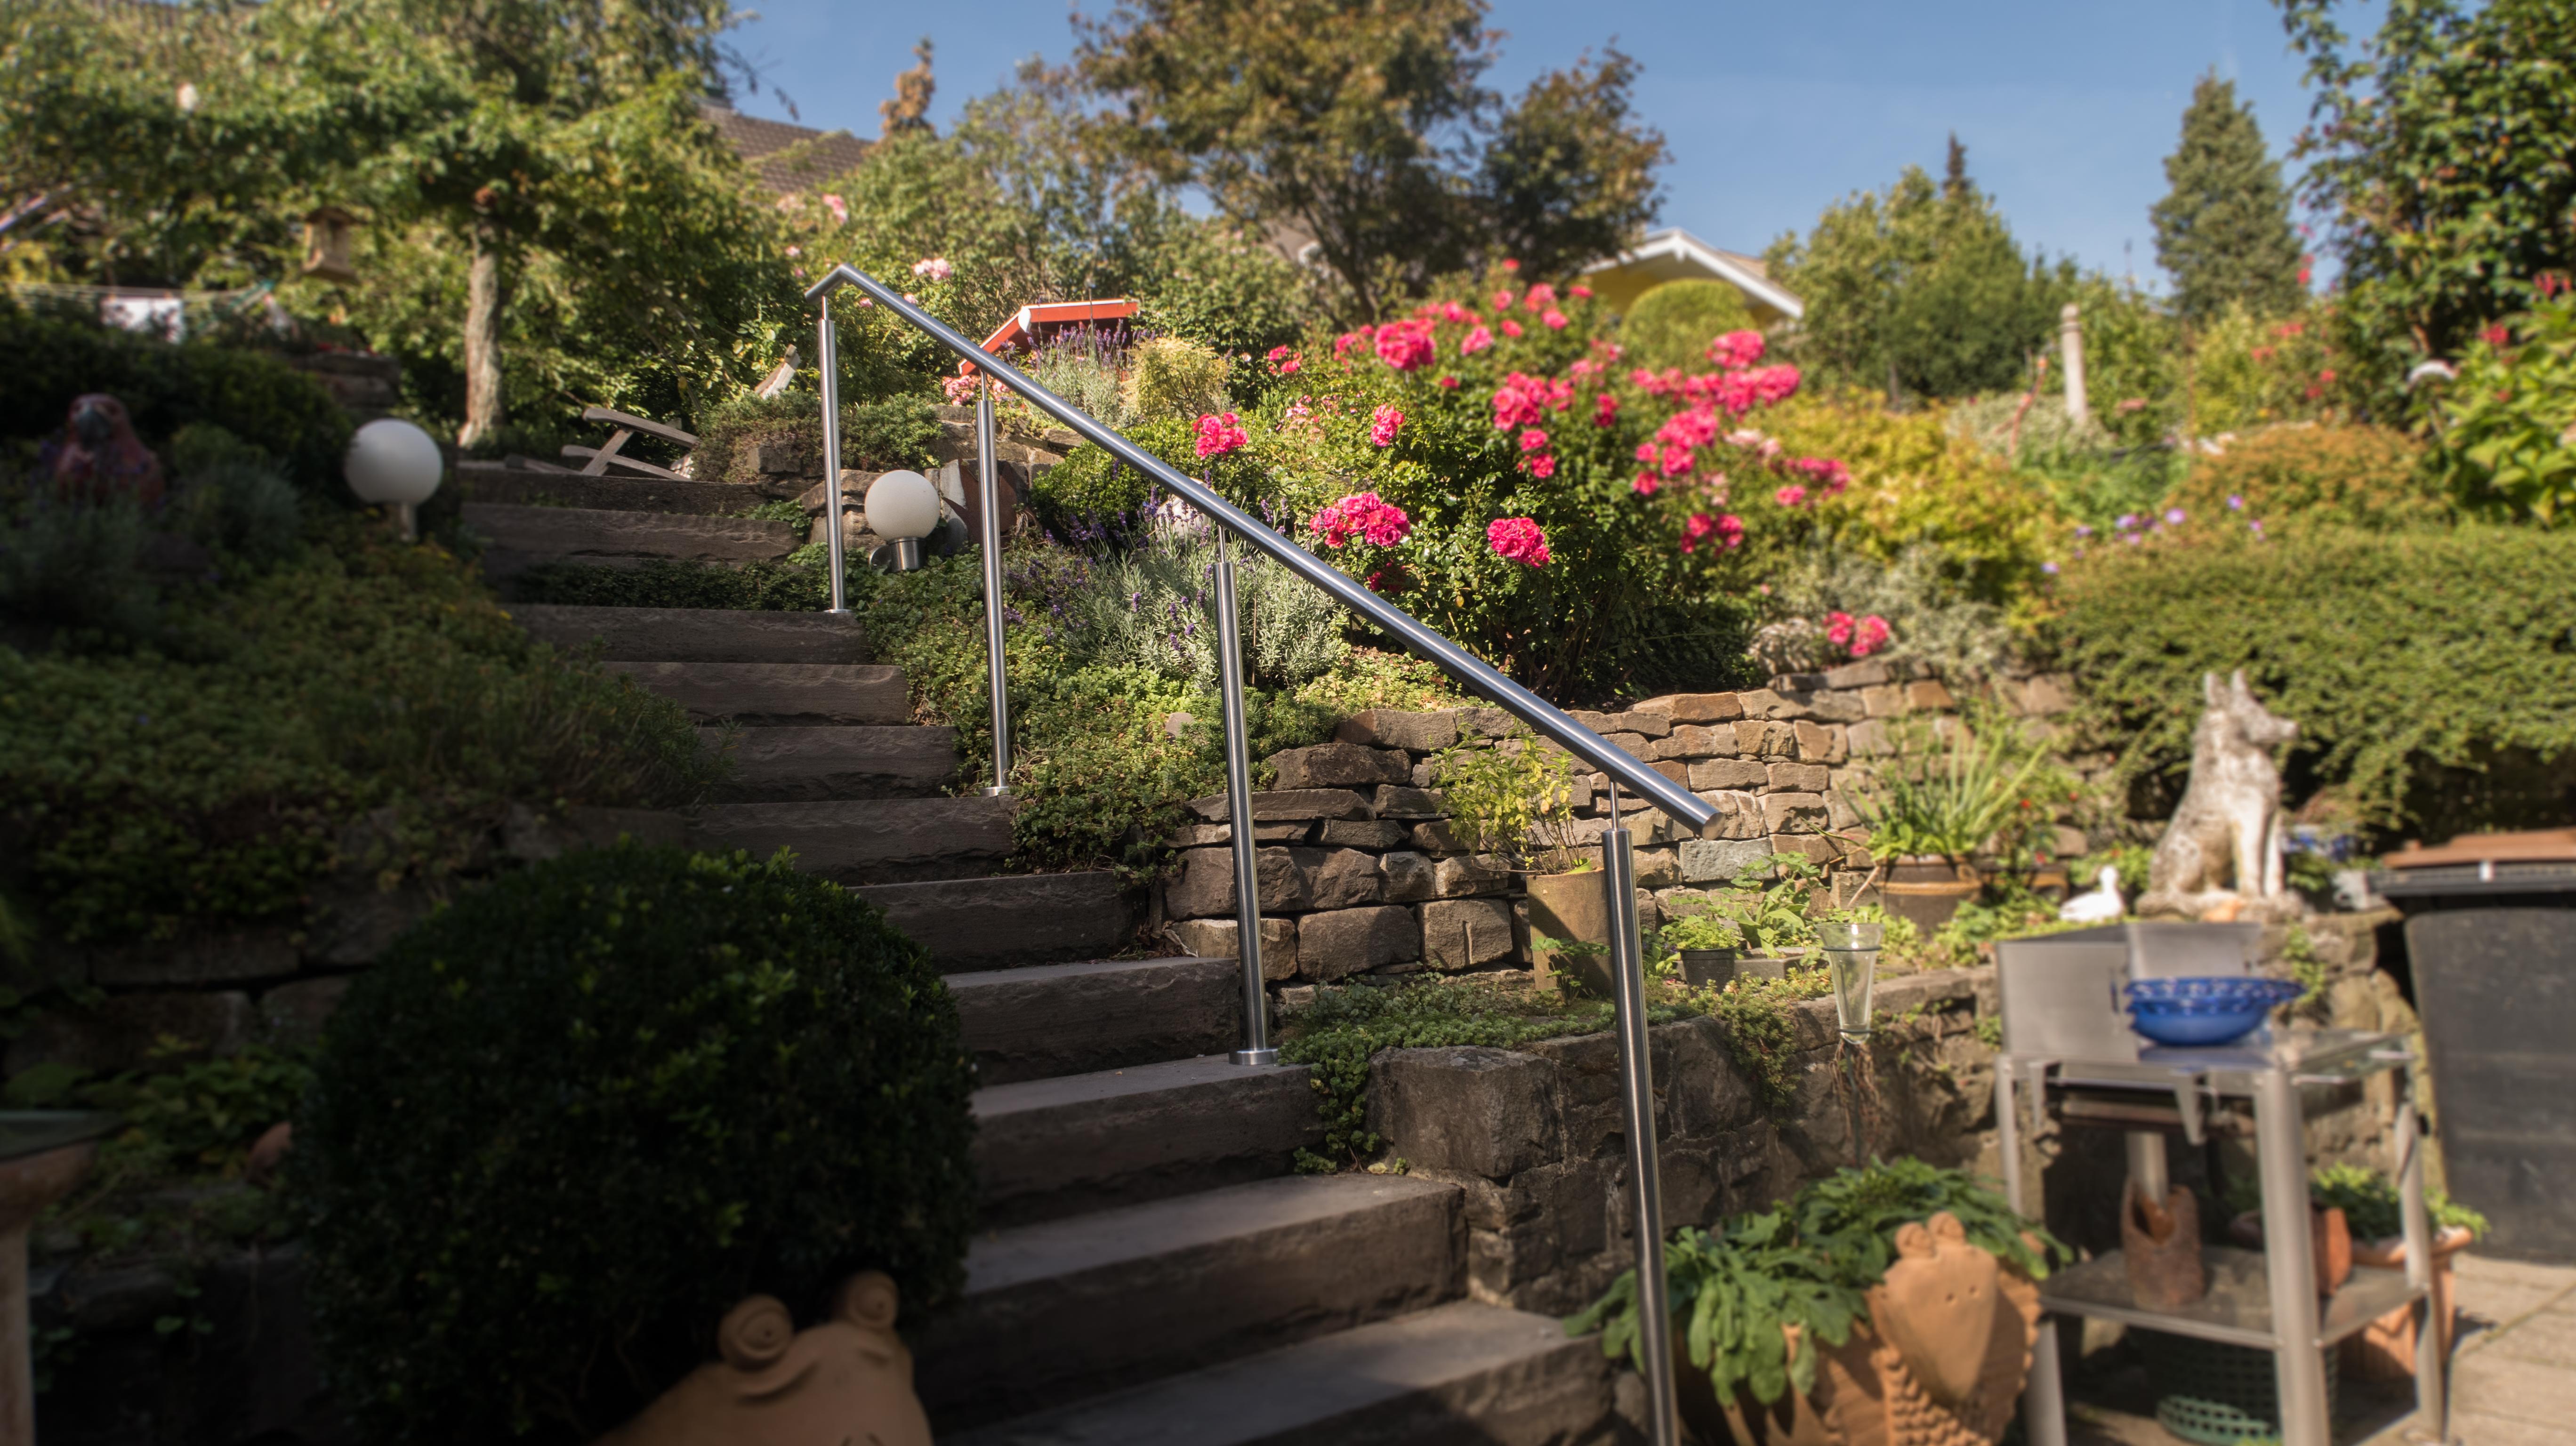 Handlauf Gartentreppe